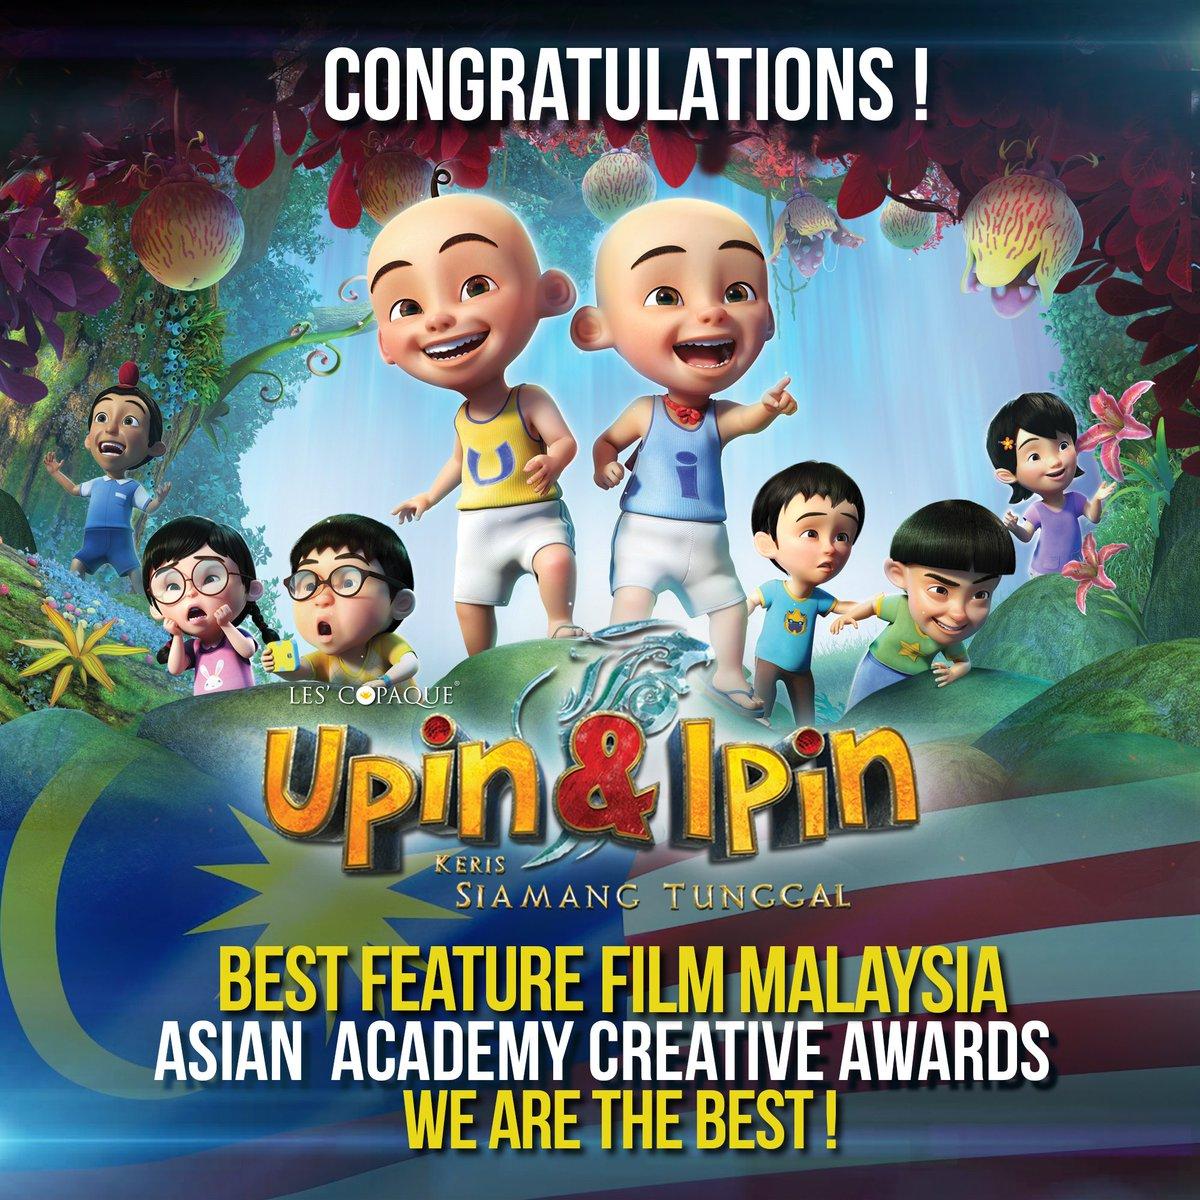 Download Game Upin Ipin Keris Siamang Tunggal 2 - Berbagi Game